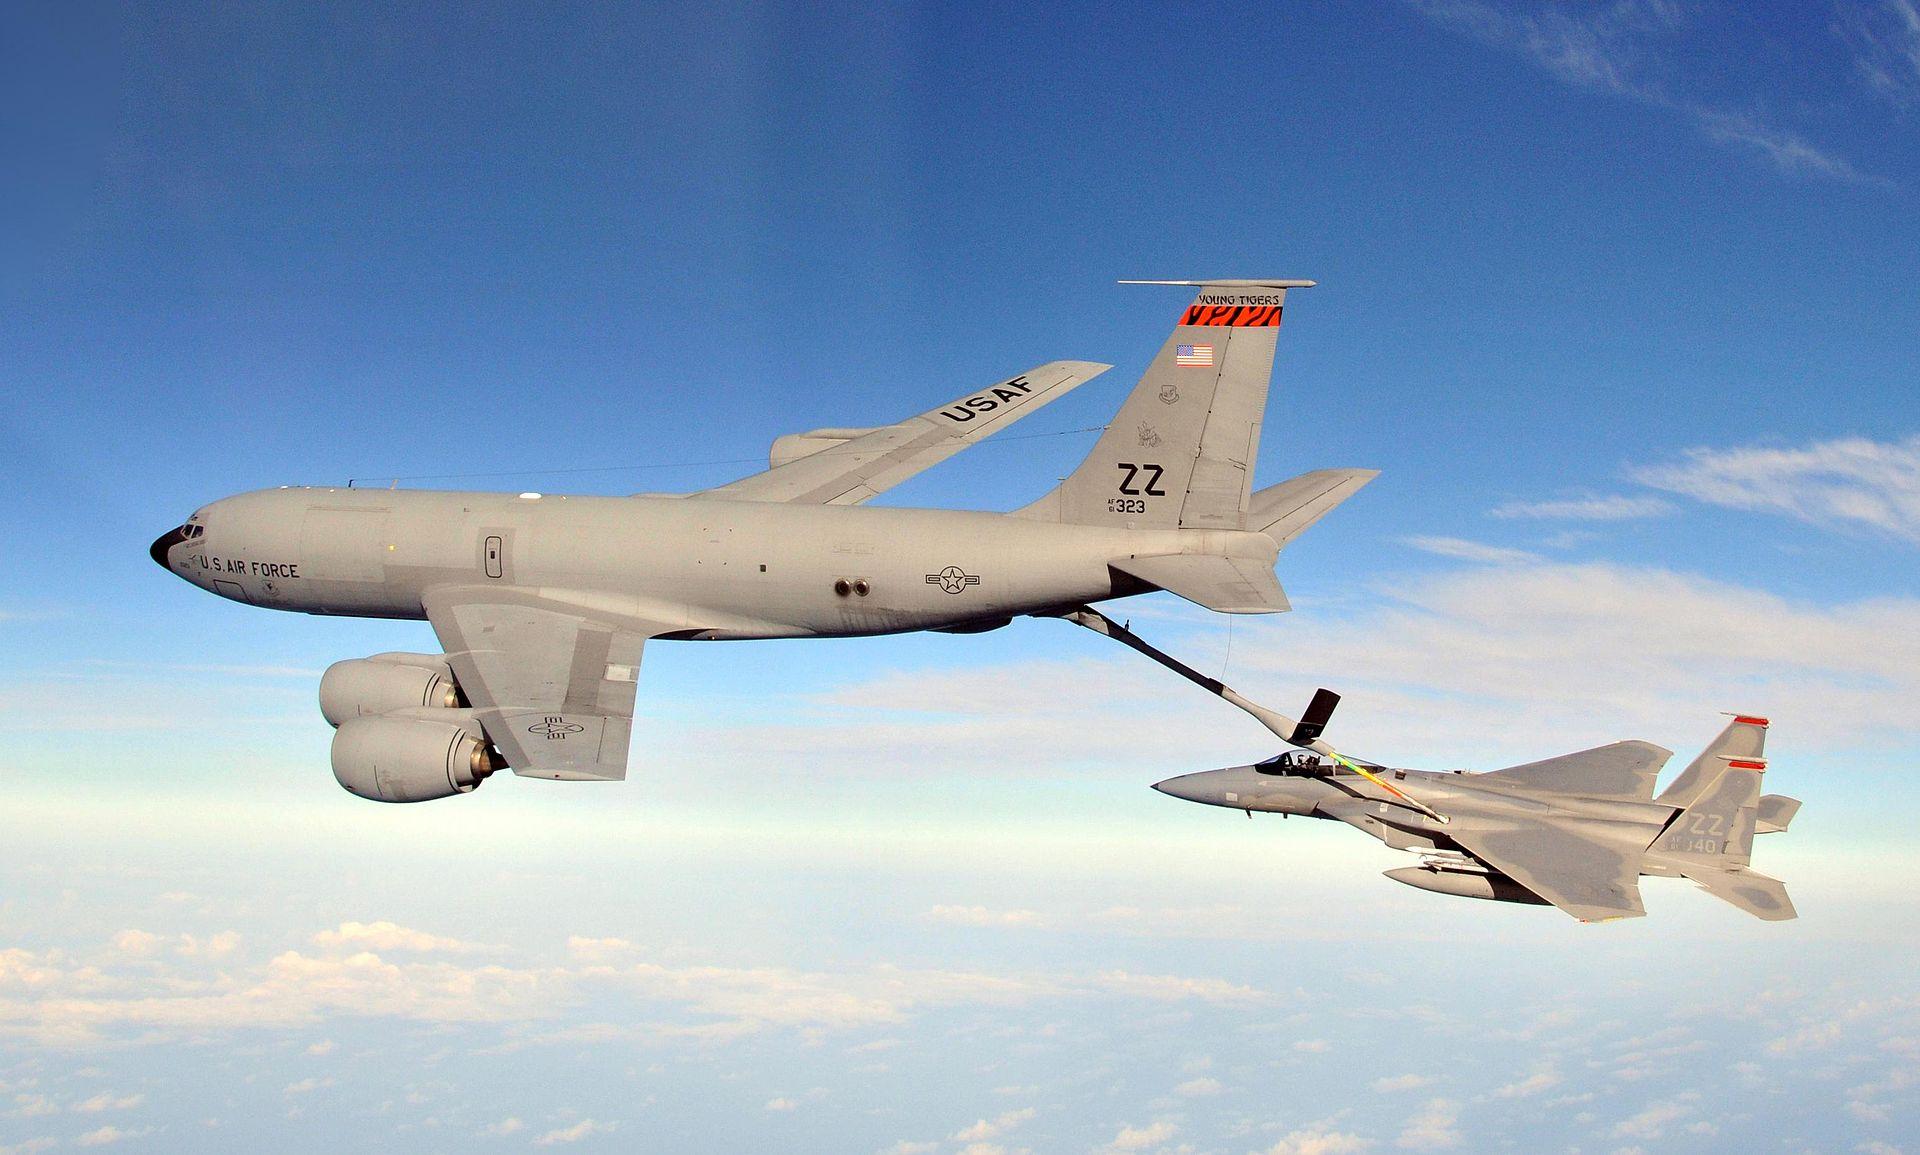 KC-135 Stratotanker refuels F-15C Eagle